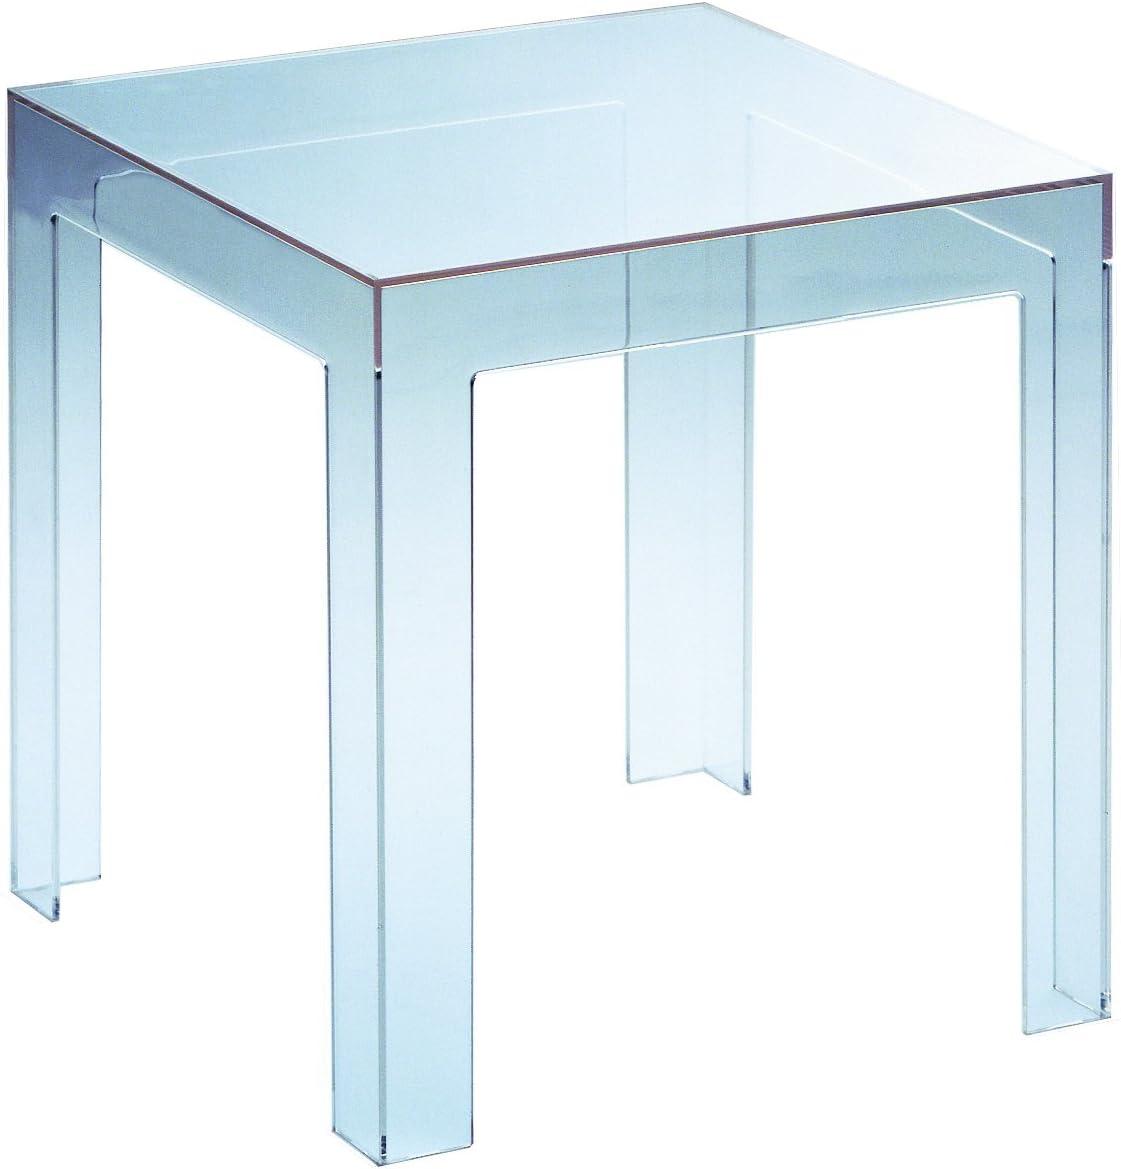 Kartell jolly tavolino blu 40 x 40 x 40 cm 8850/Y5